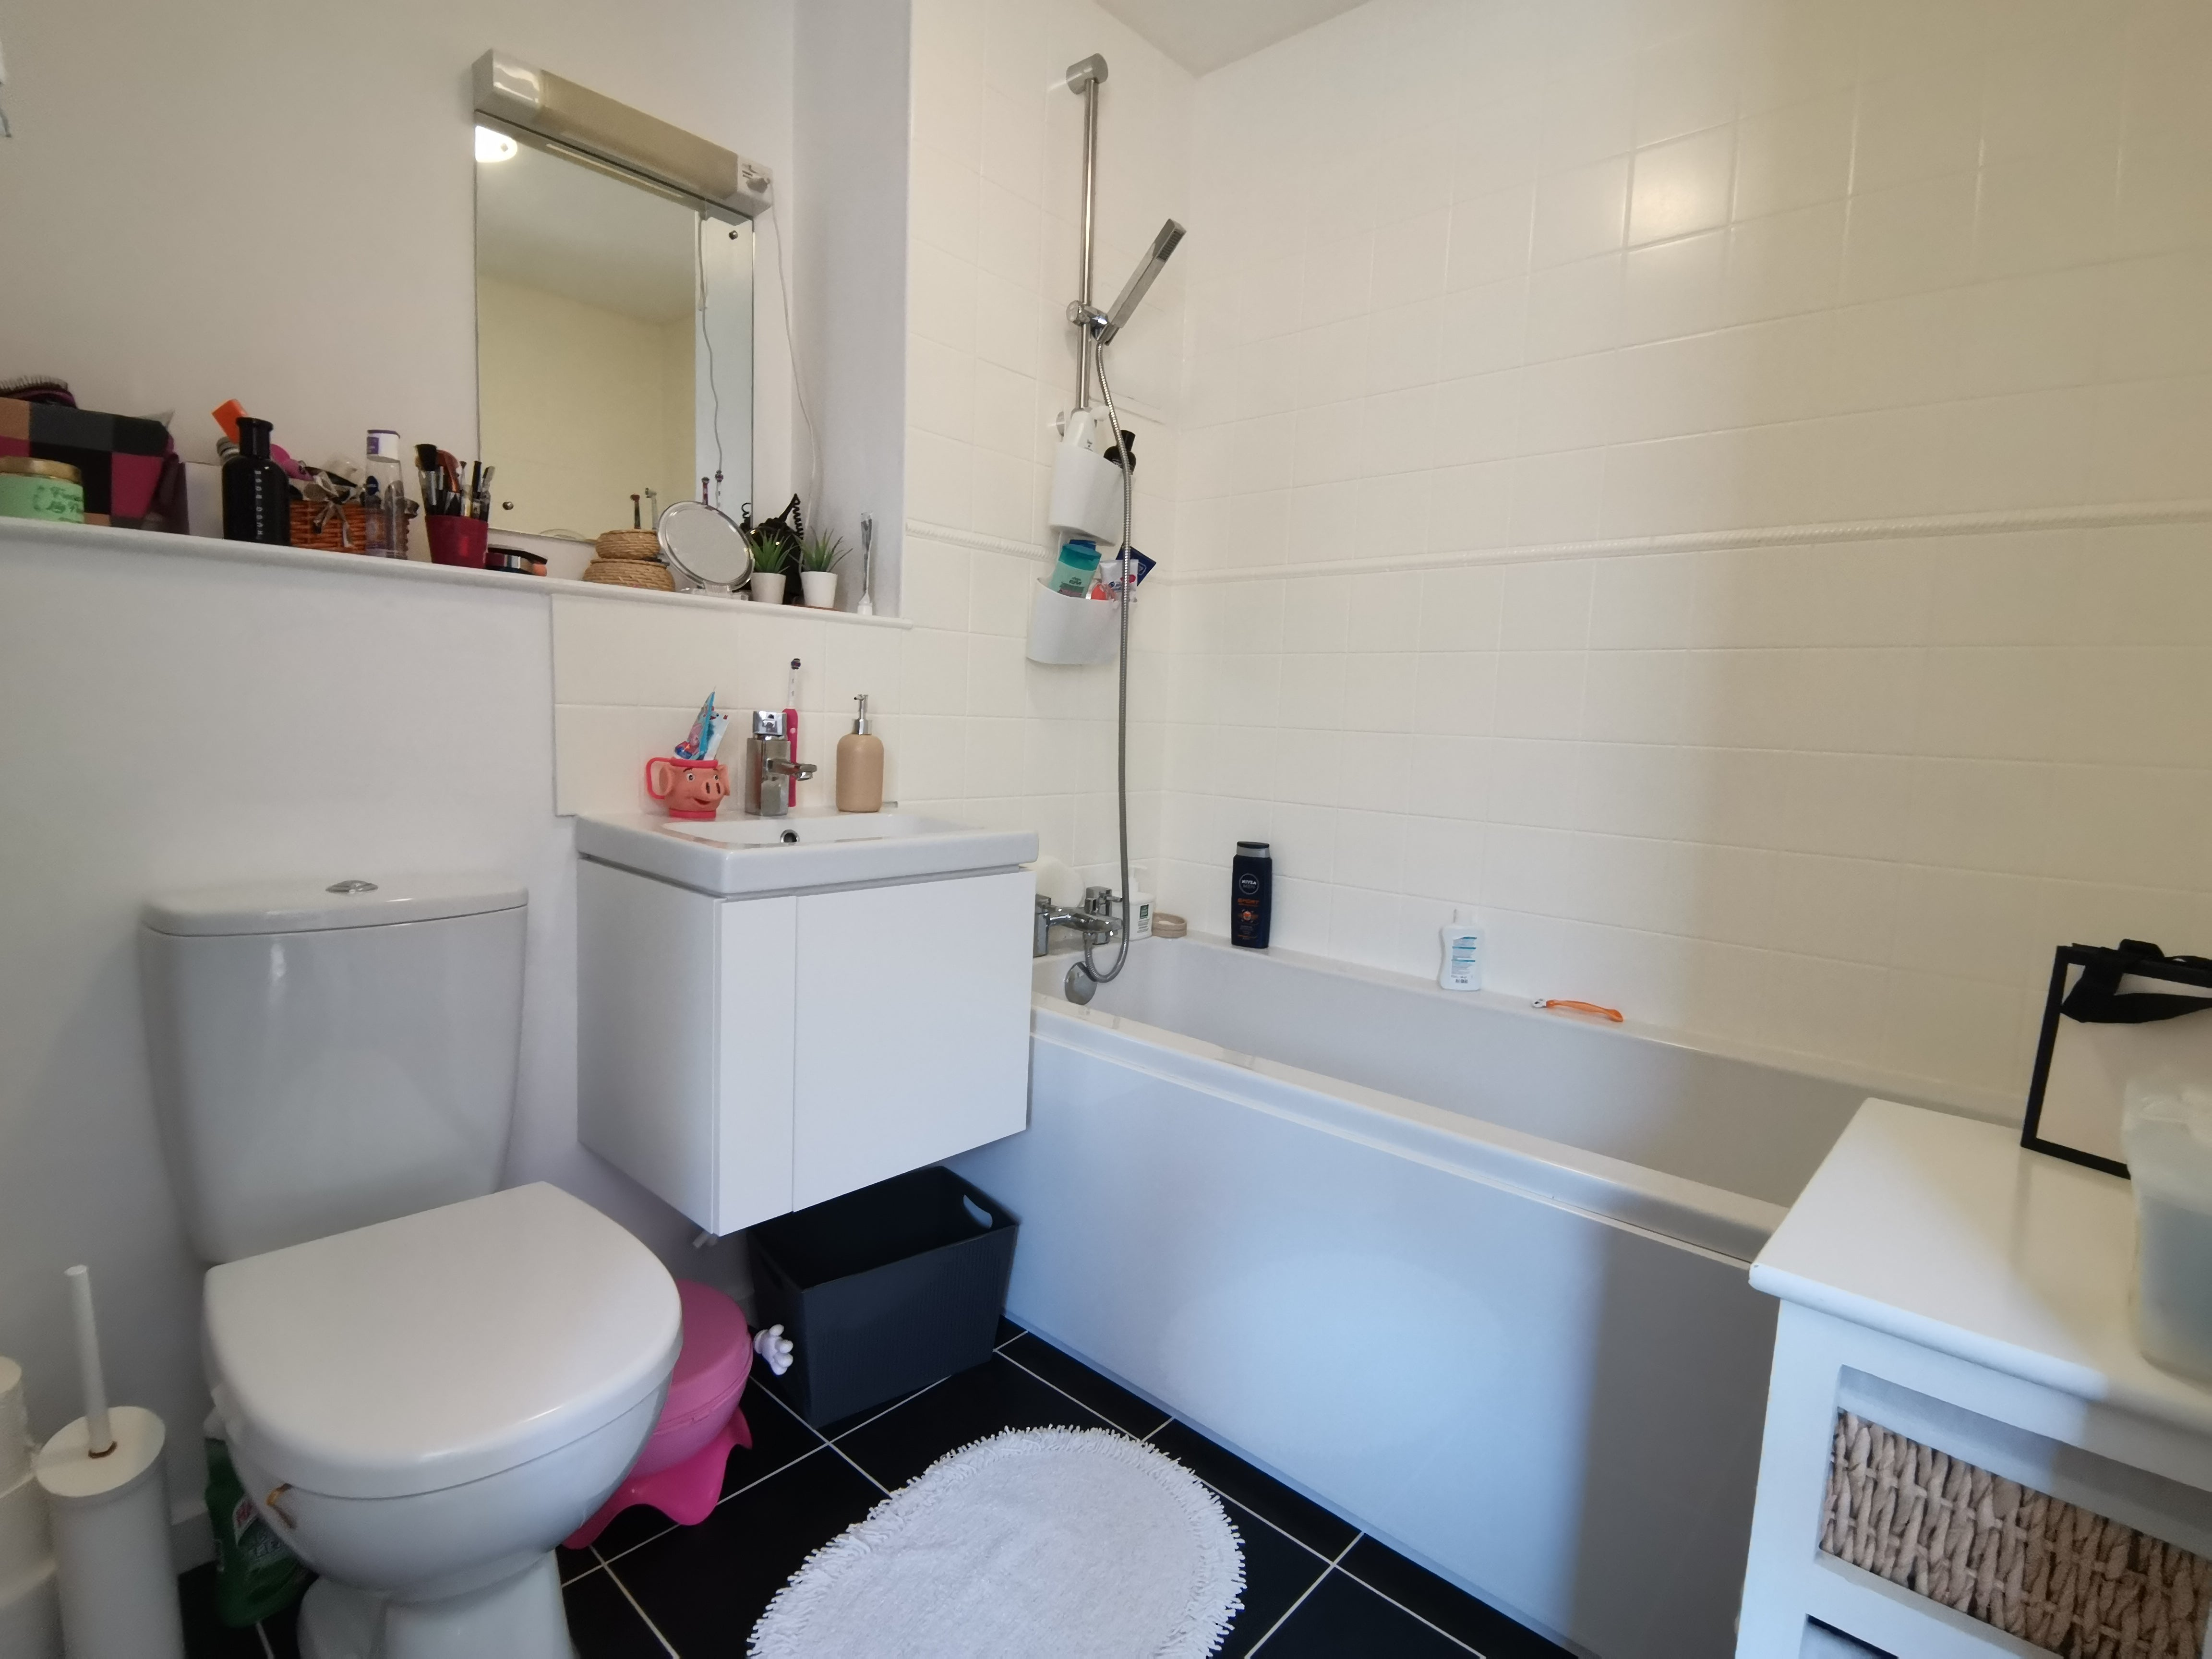 Flat 12 Heathcote Court, Heathcote Road - Bathroom